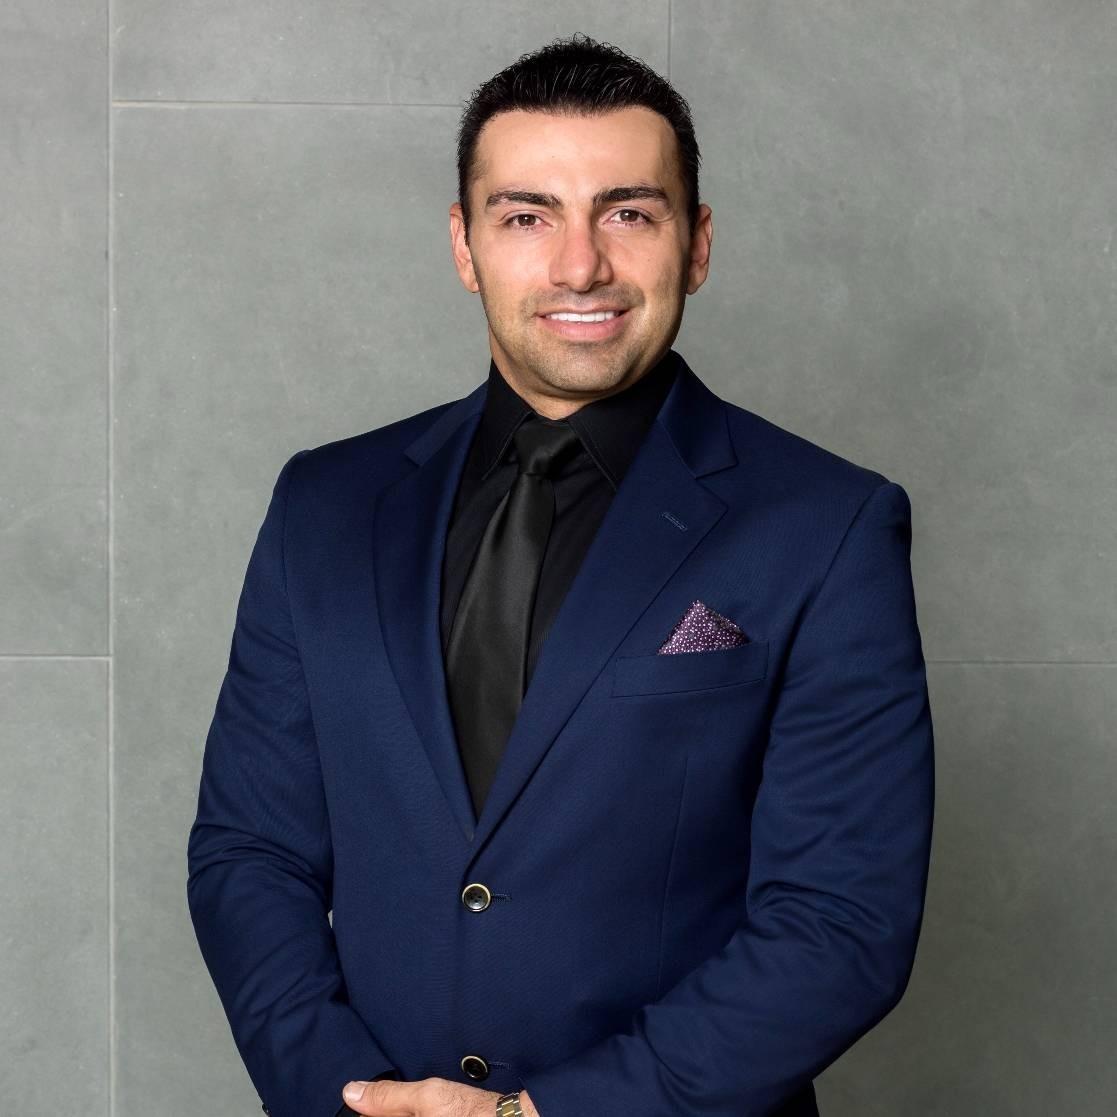 Kianoush Darban